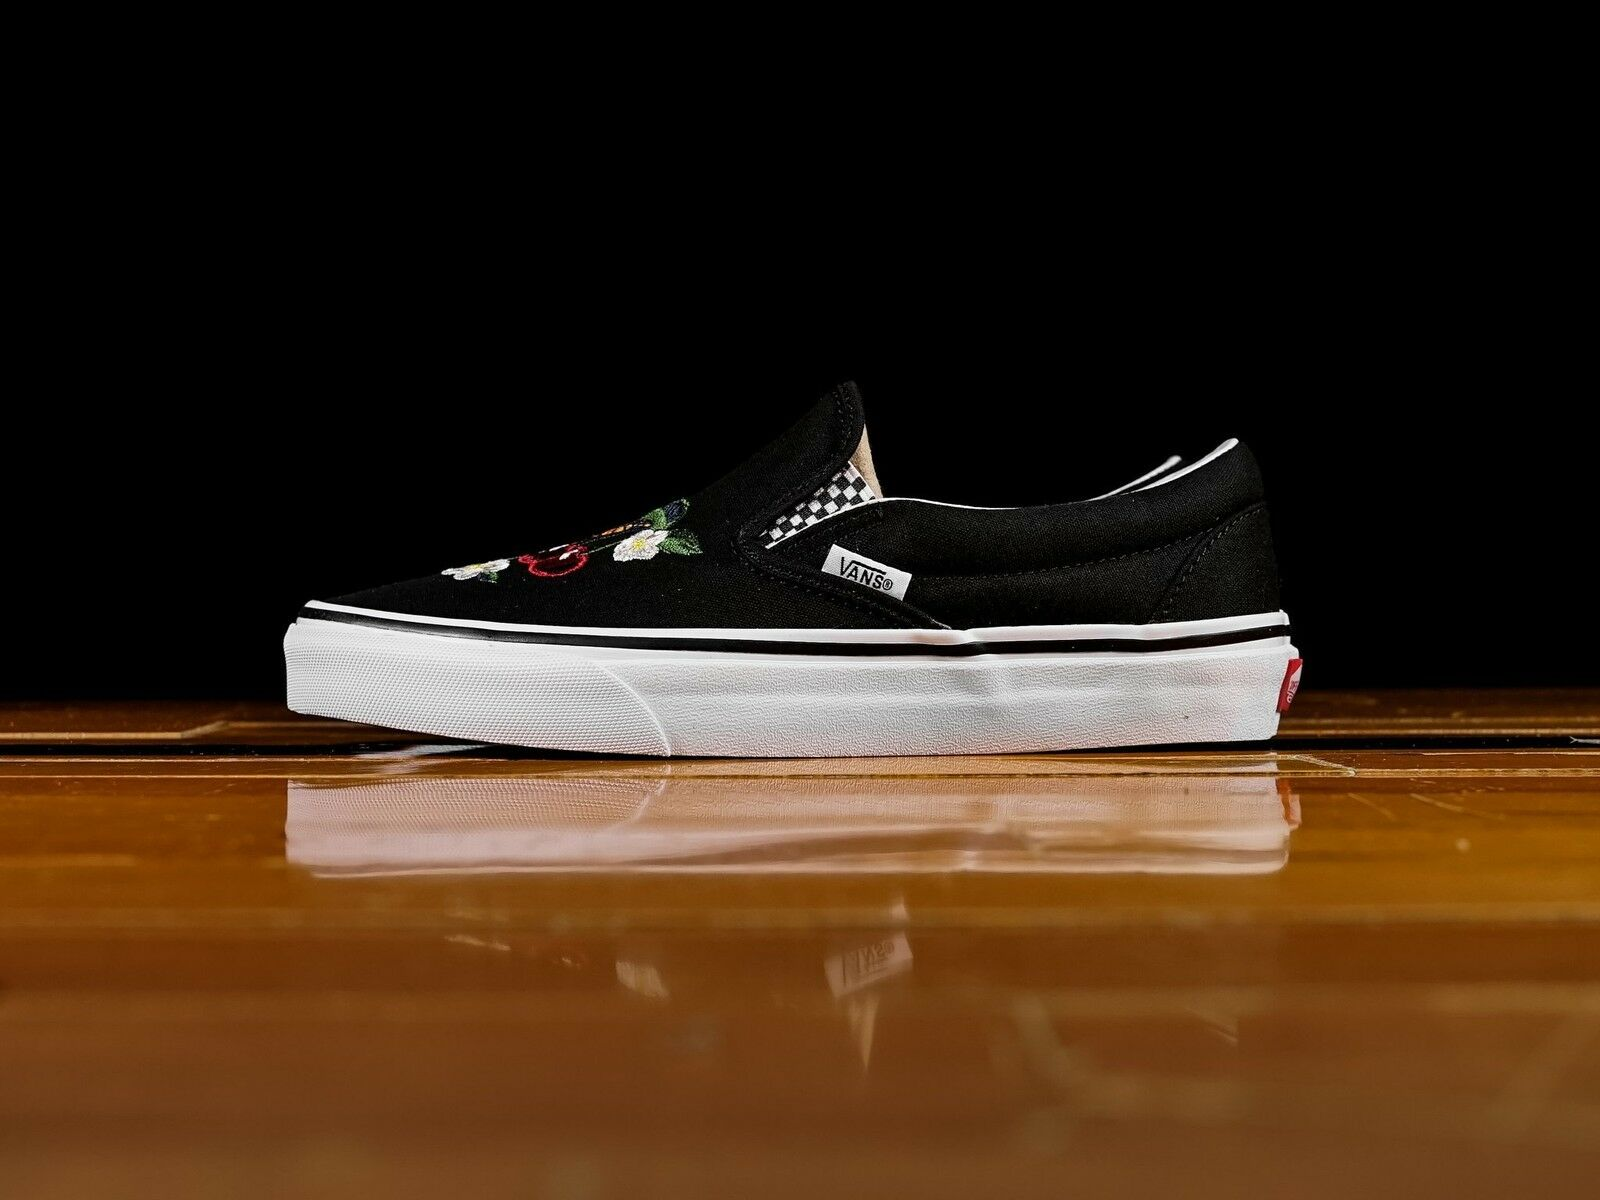 Vans UA UA UA Classic Slip-On Checker Floral nero Uomo scarpe Skate New VN0A38F7I5Z 6c7b68